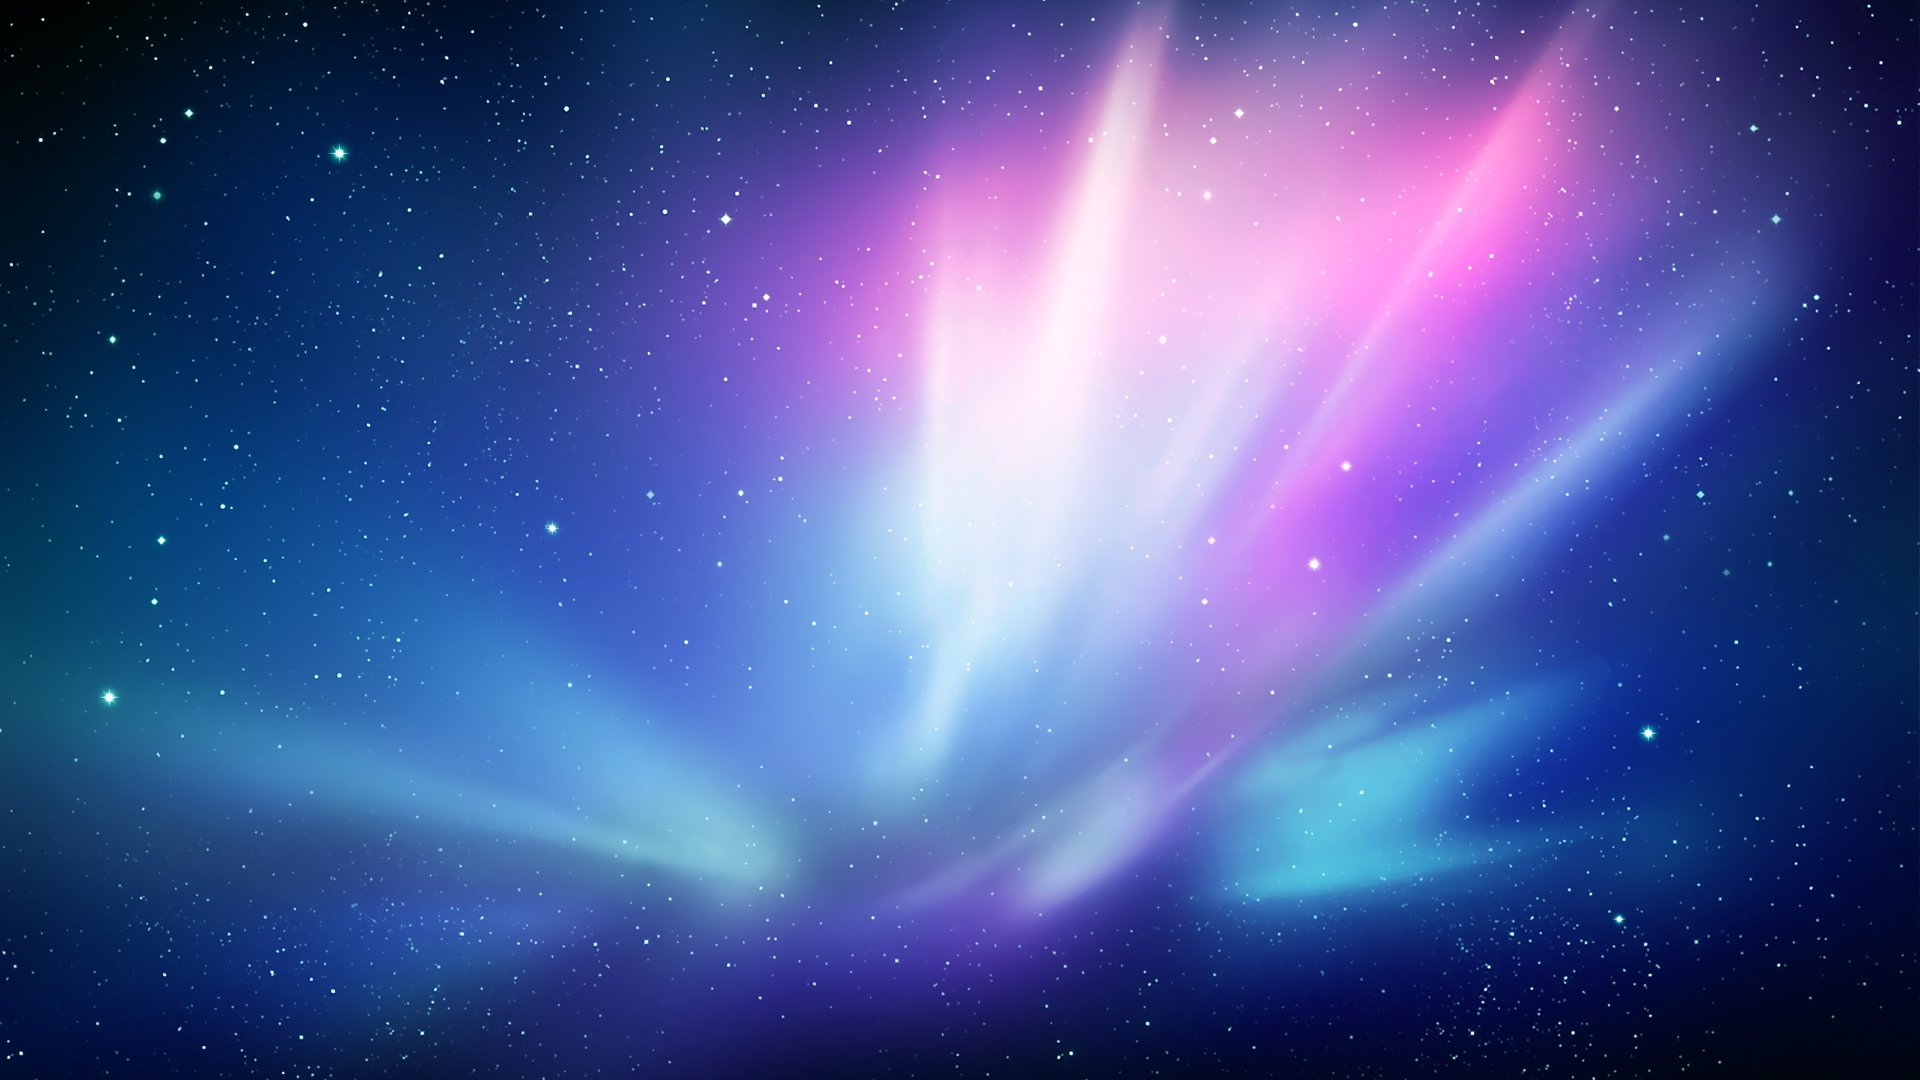 Aurora Borealis Computer Wallpapers Desktop Backgrounds 1920x1080